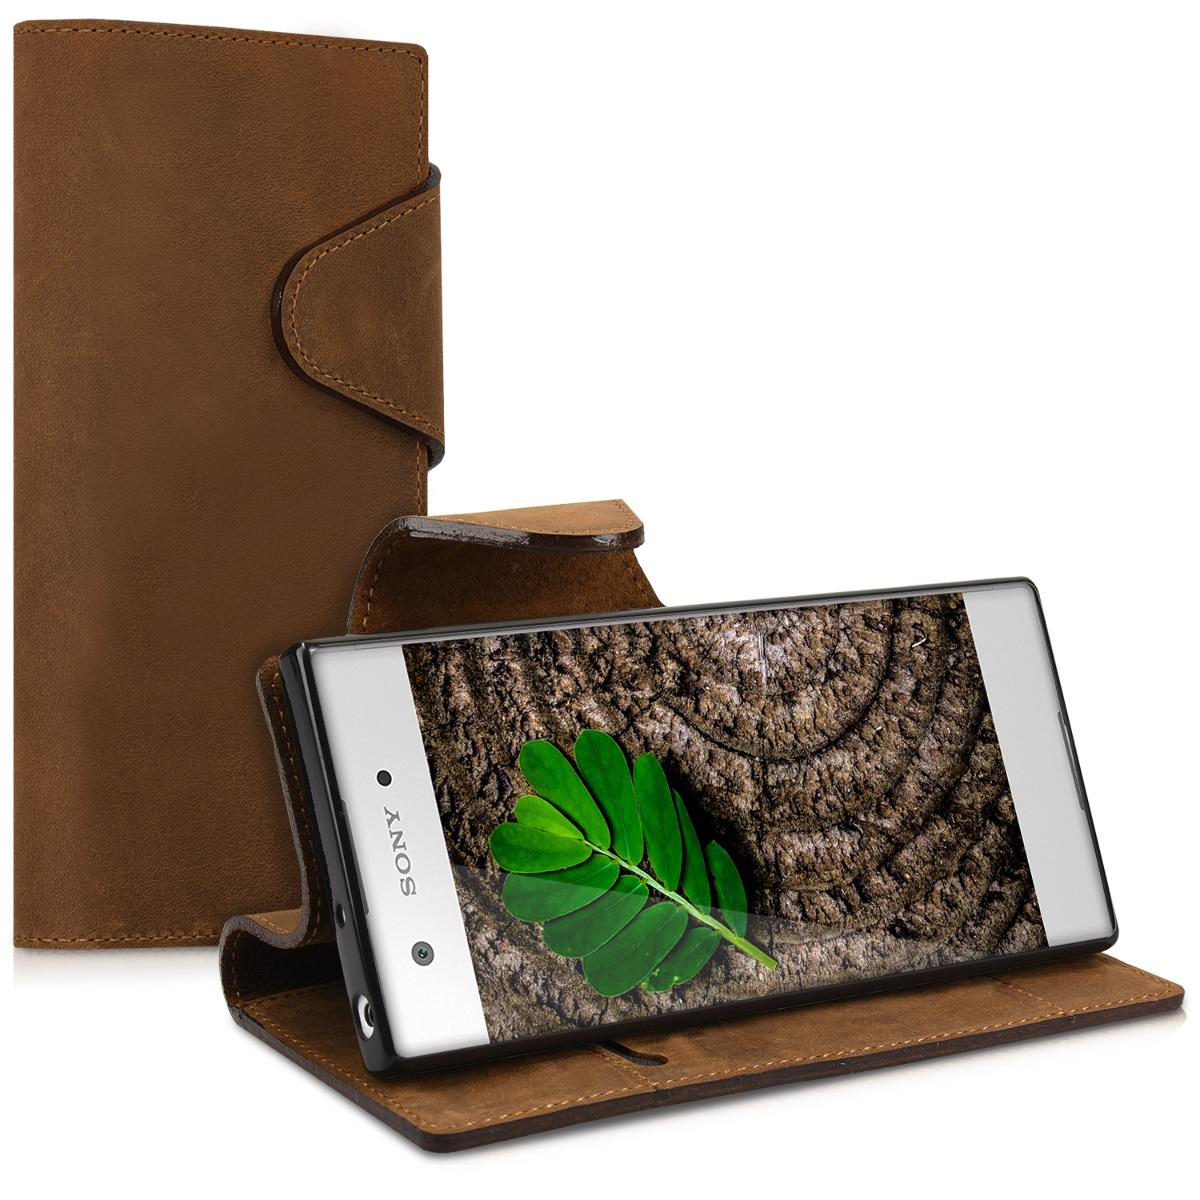 Kalibri Δερμάτινη Suede Θήκη - Πορτοφόλι Sony Xperia XA1 - Brown (41347.05)